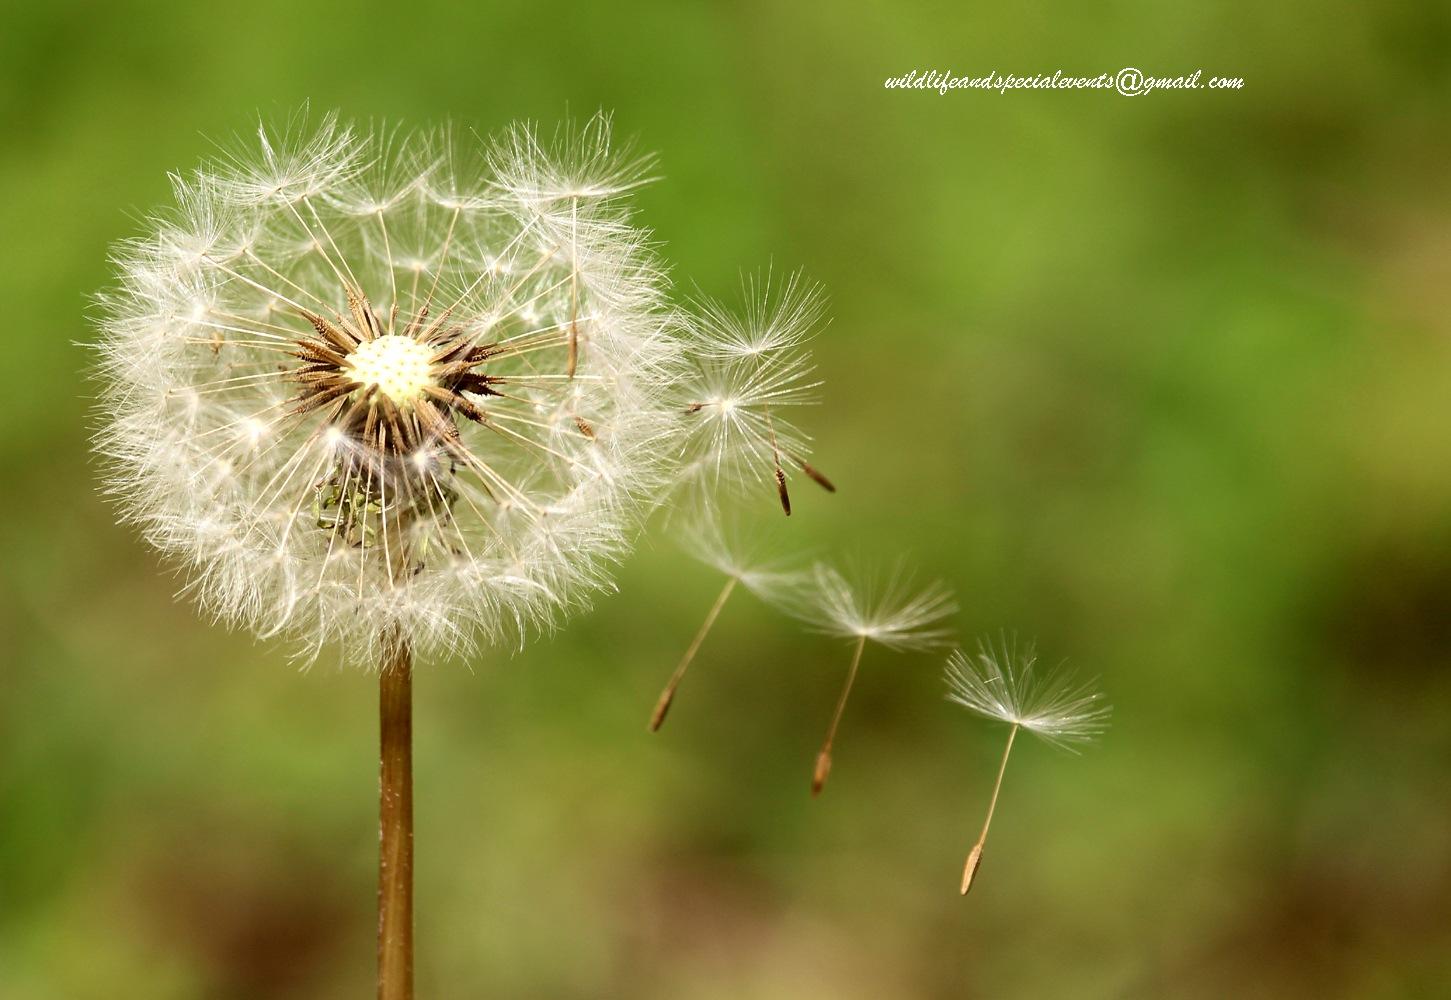 Dandelion in the wind by oosie